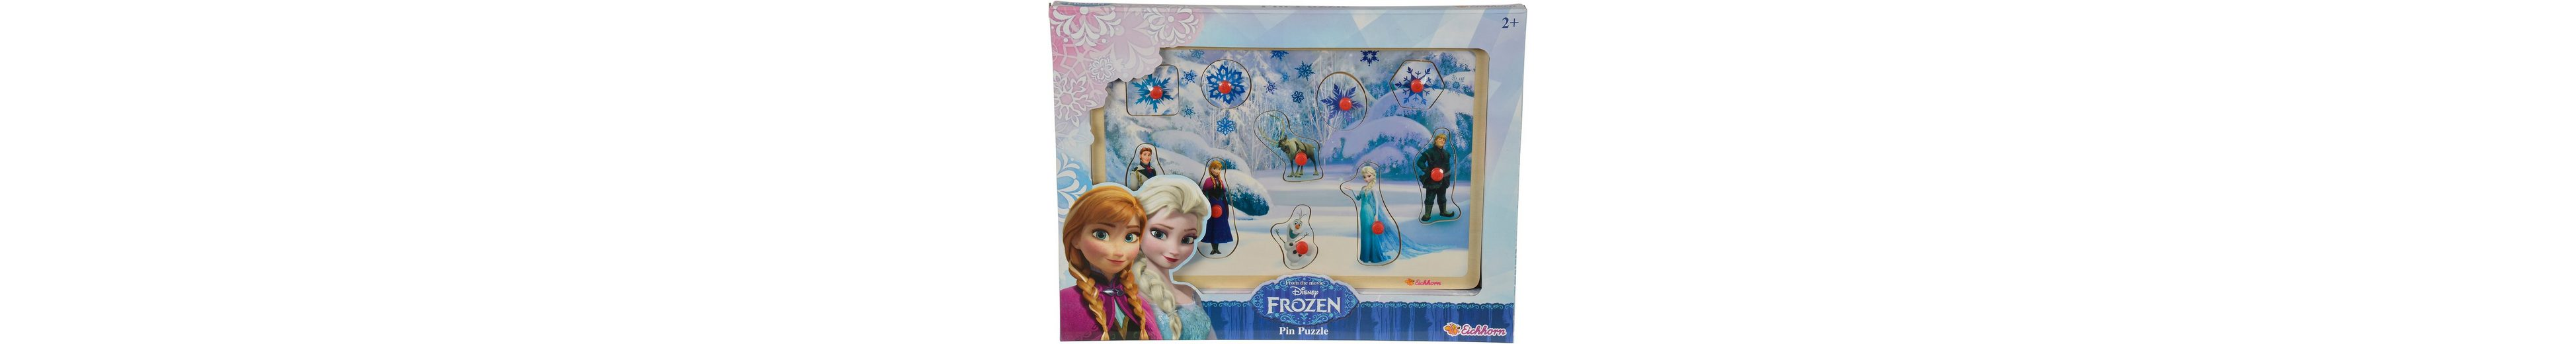 Eichhorn Holzpuzzle, »Disney Frozen Steckpuzzle«